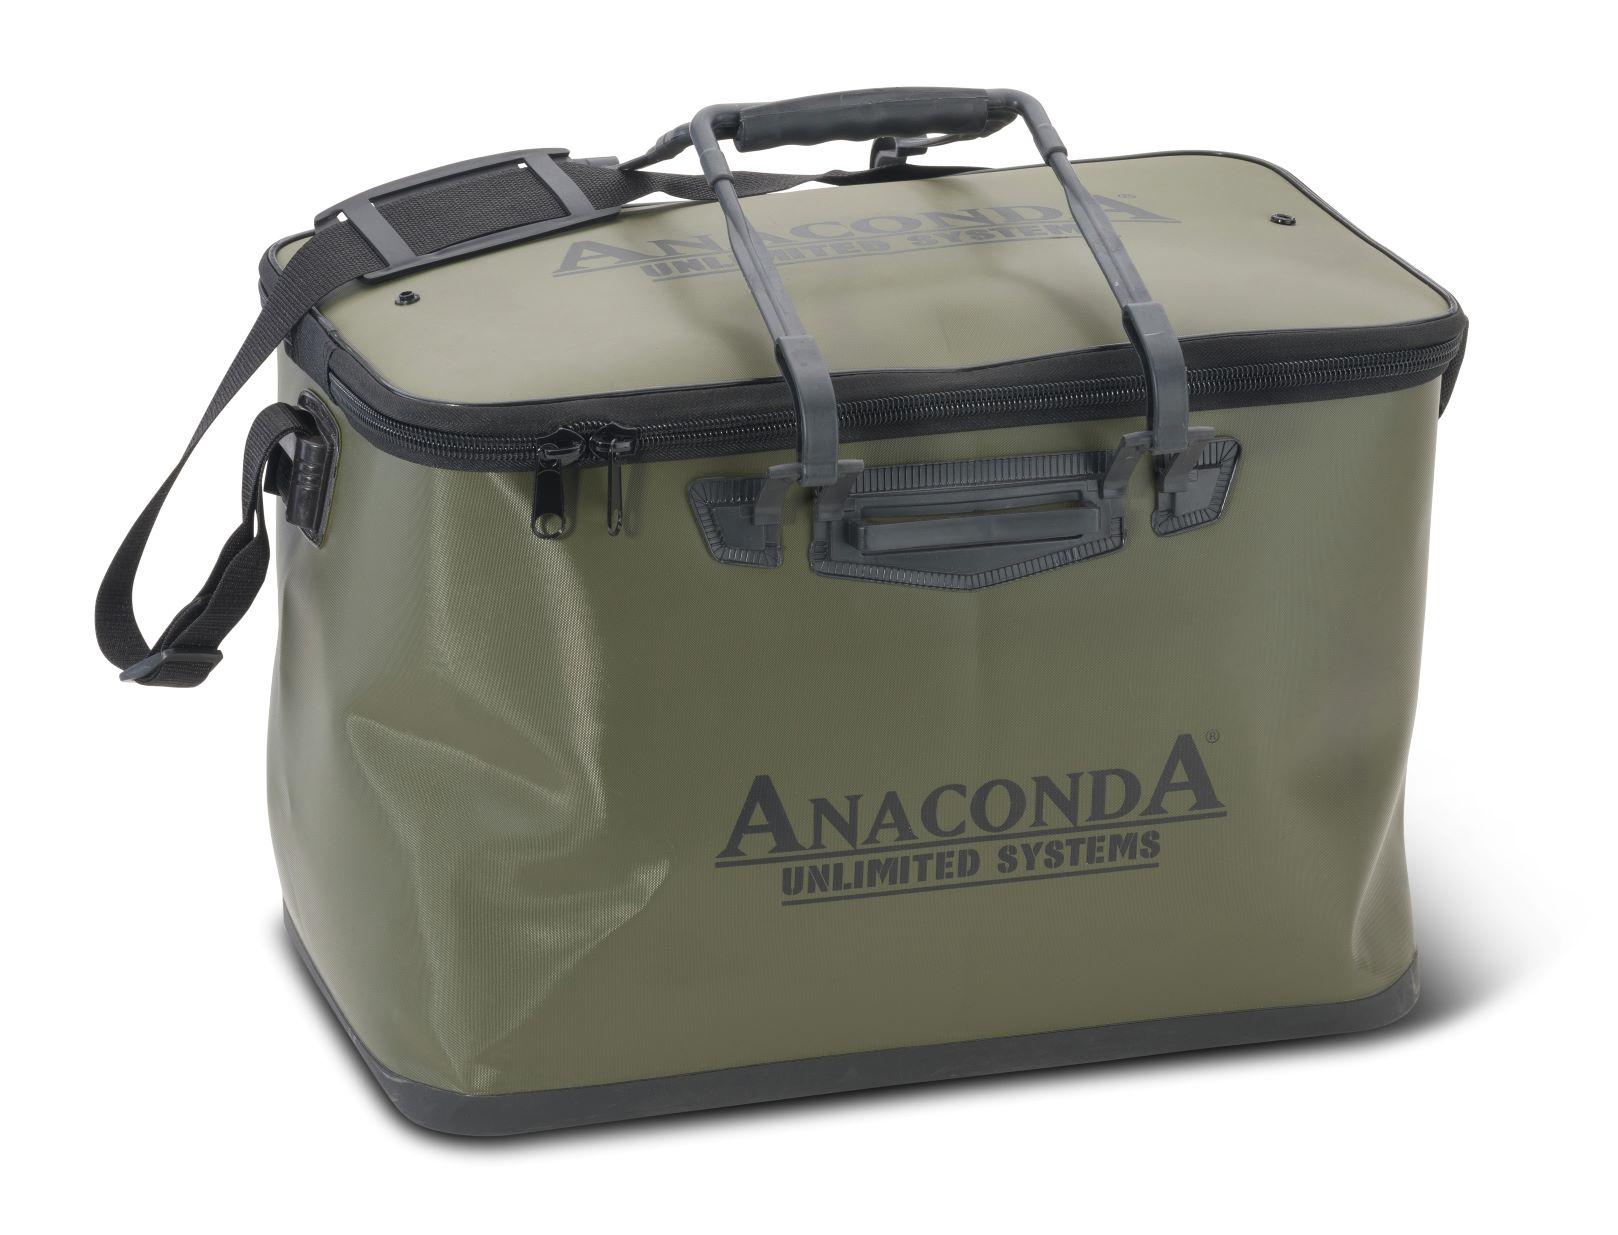 Anaconda taška Tank varianta: L 50